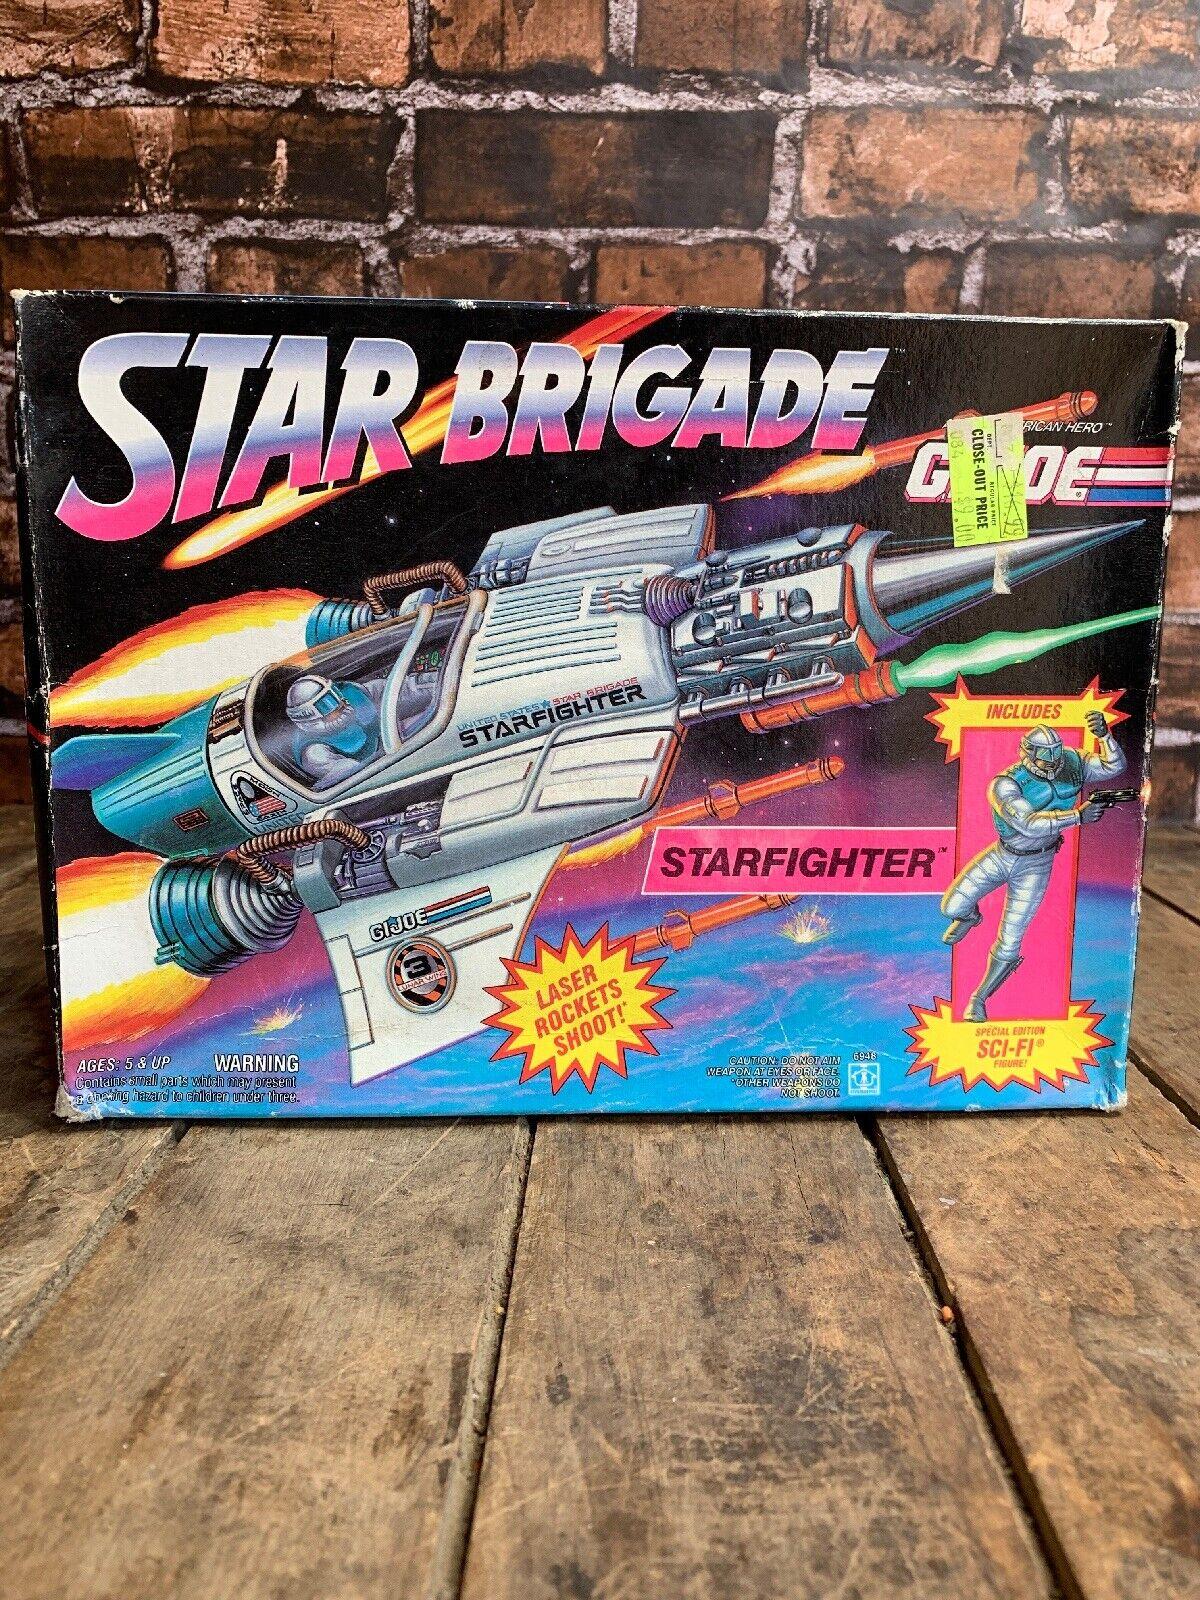 GI Joe Star Birgade Starfighter 1993 MIB SEALED   Original Hasbro Box ARAH